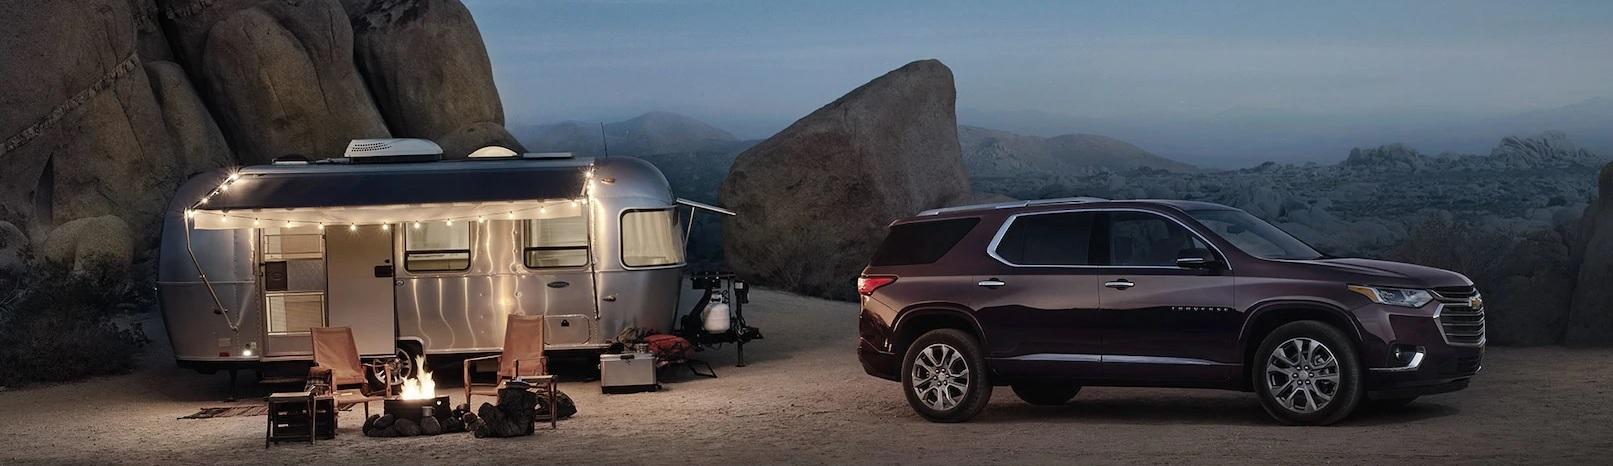 2020 Chevrolet Traverse Financing near Mobile, AL